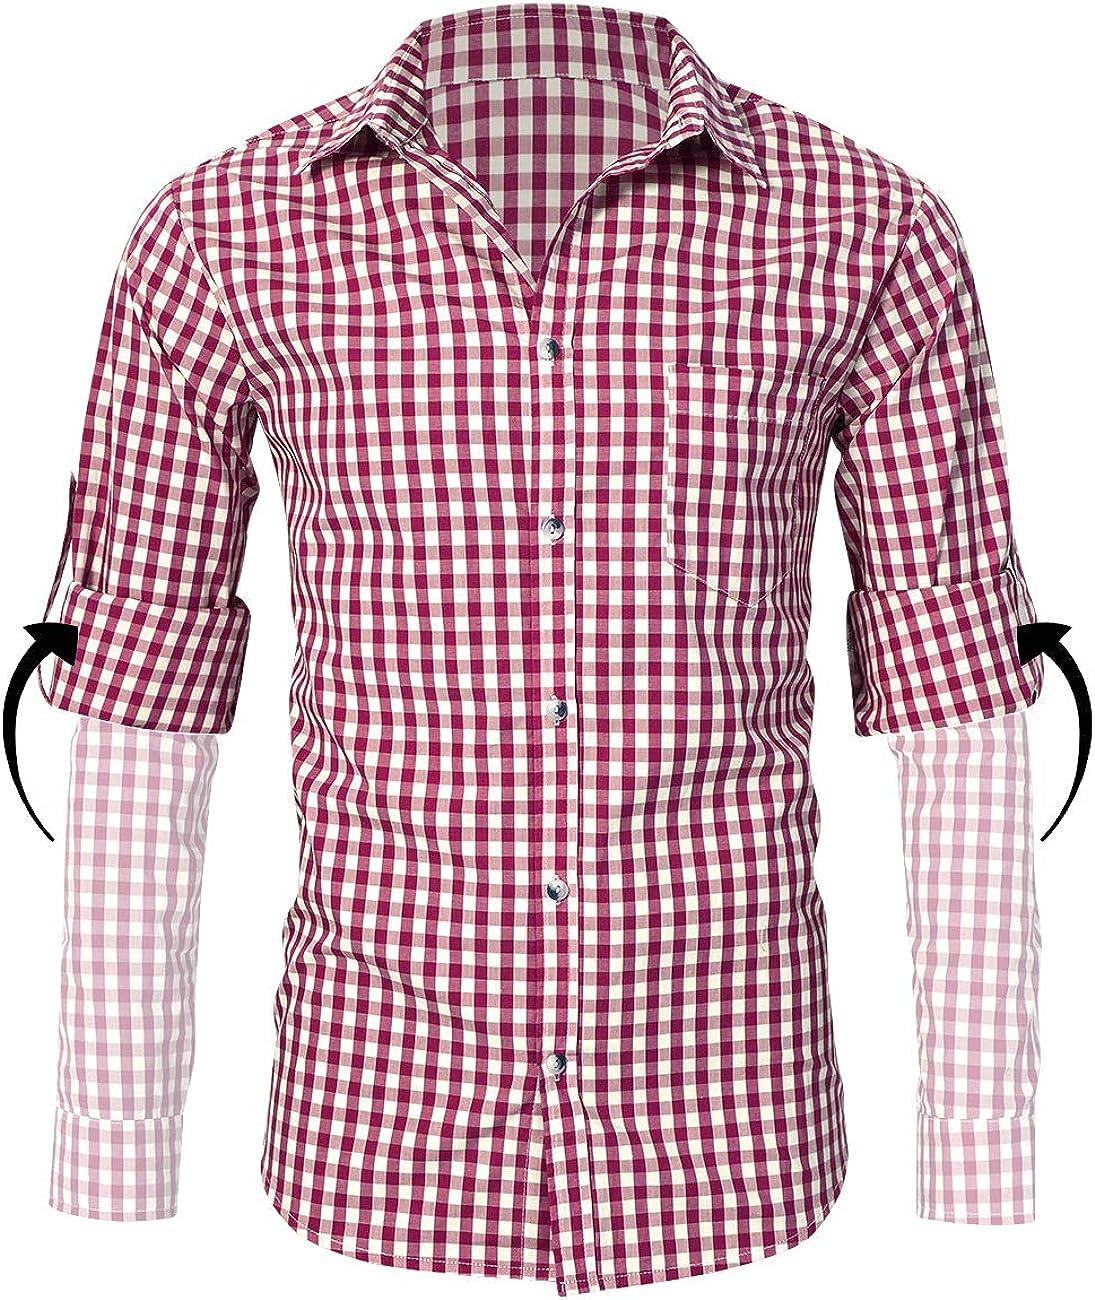 KOJOOIN Hombre Camisa Manga Larga Slim Fit XS - 4XL Camisa de Traje típico bávaro/tirolés para Hombre Oktoberfest: Amazon.es: Ropa y accesorios